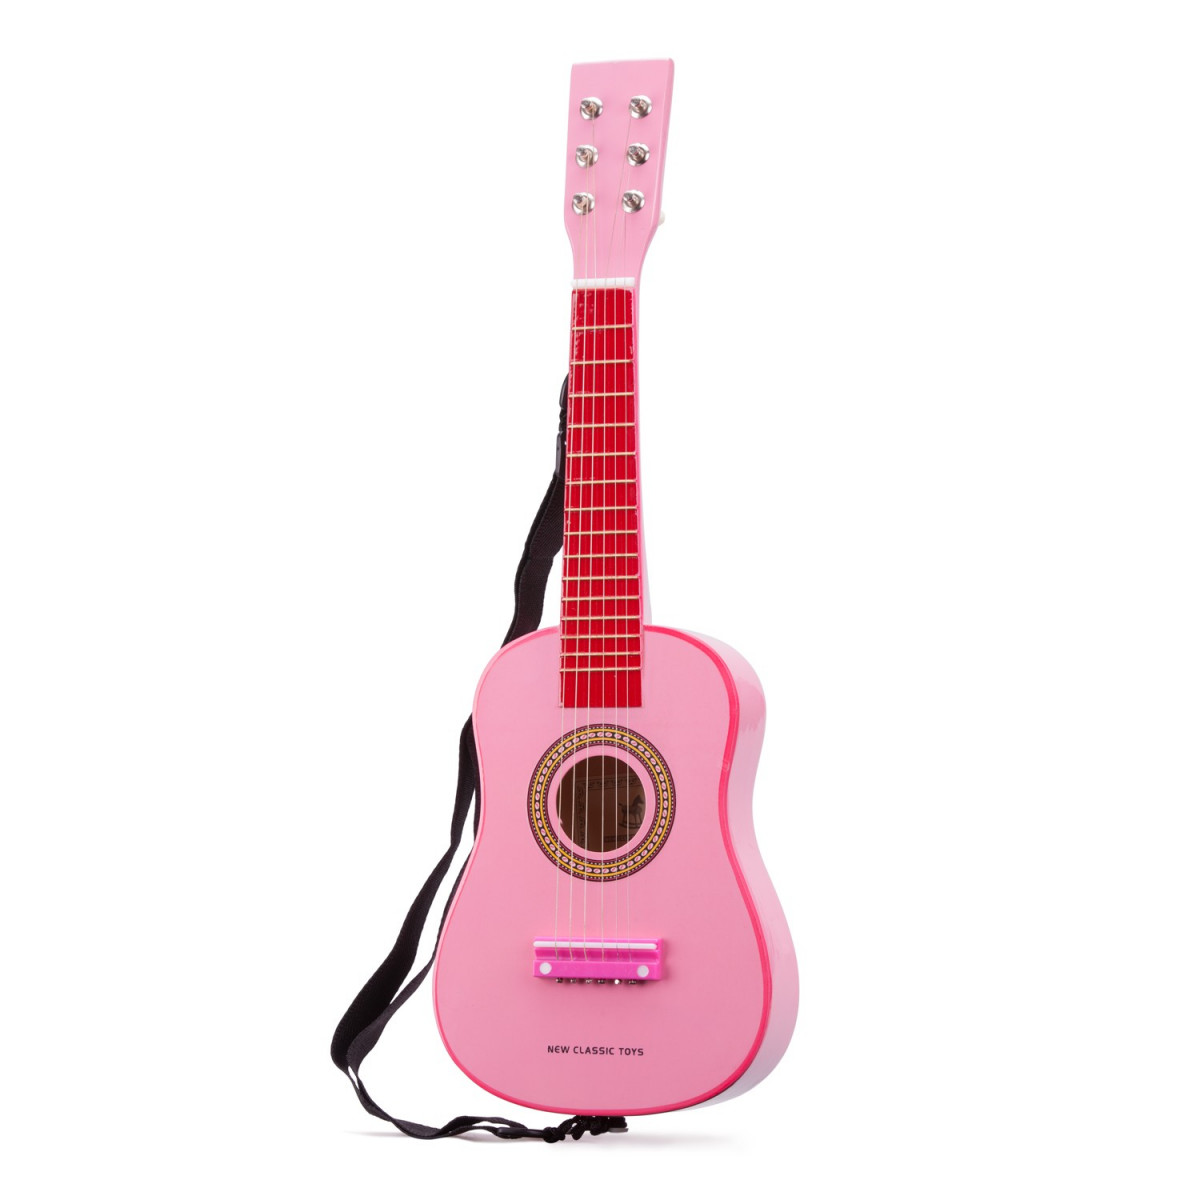 Guitare jouet rose